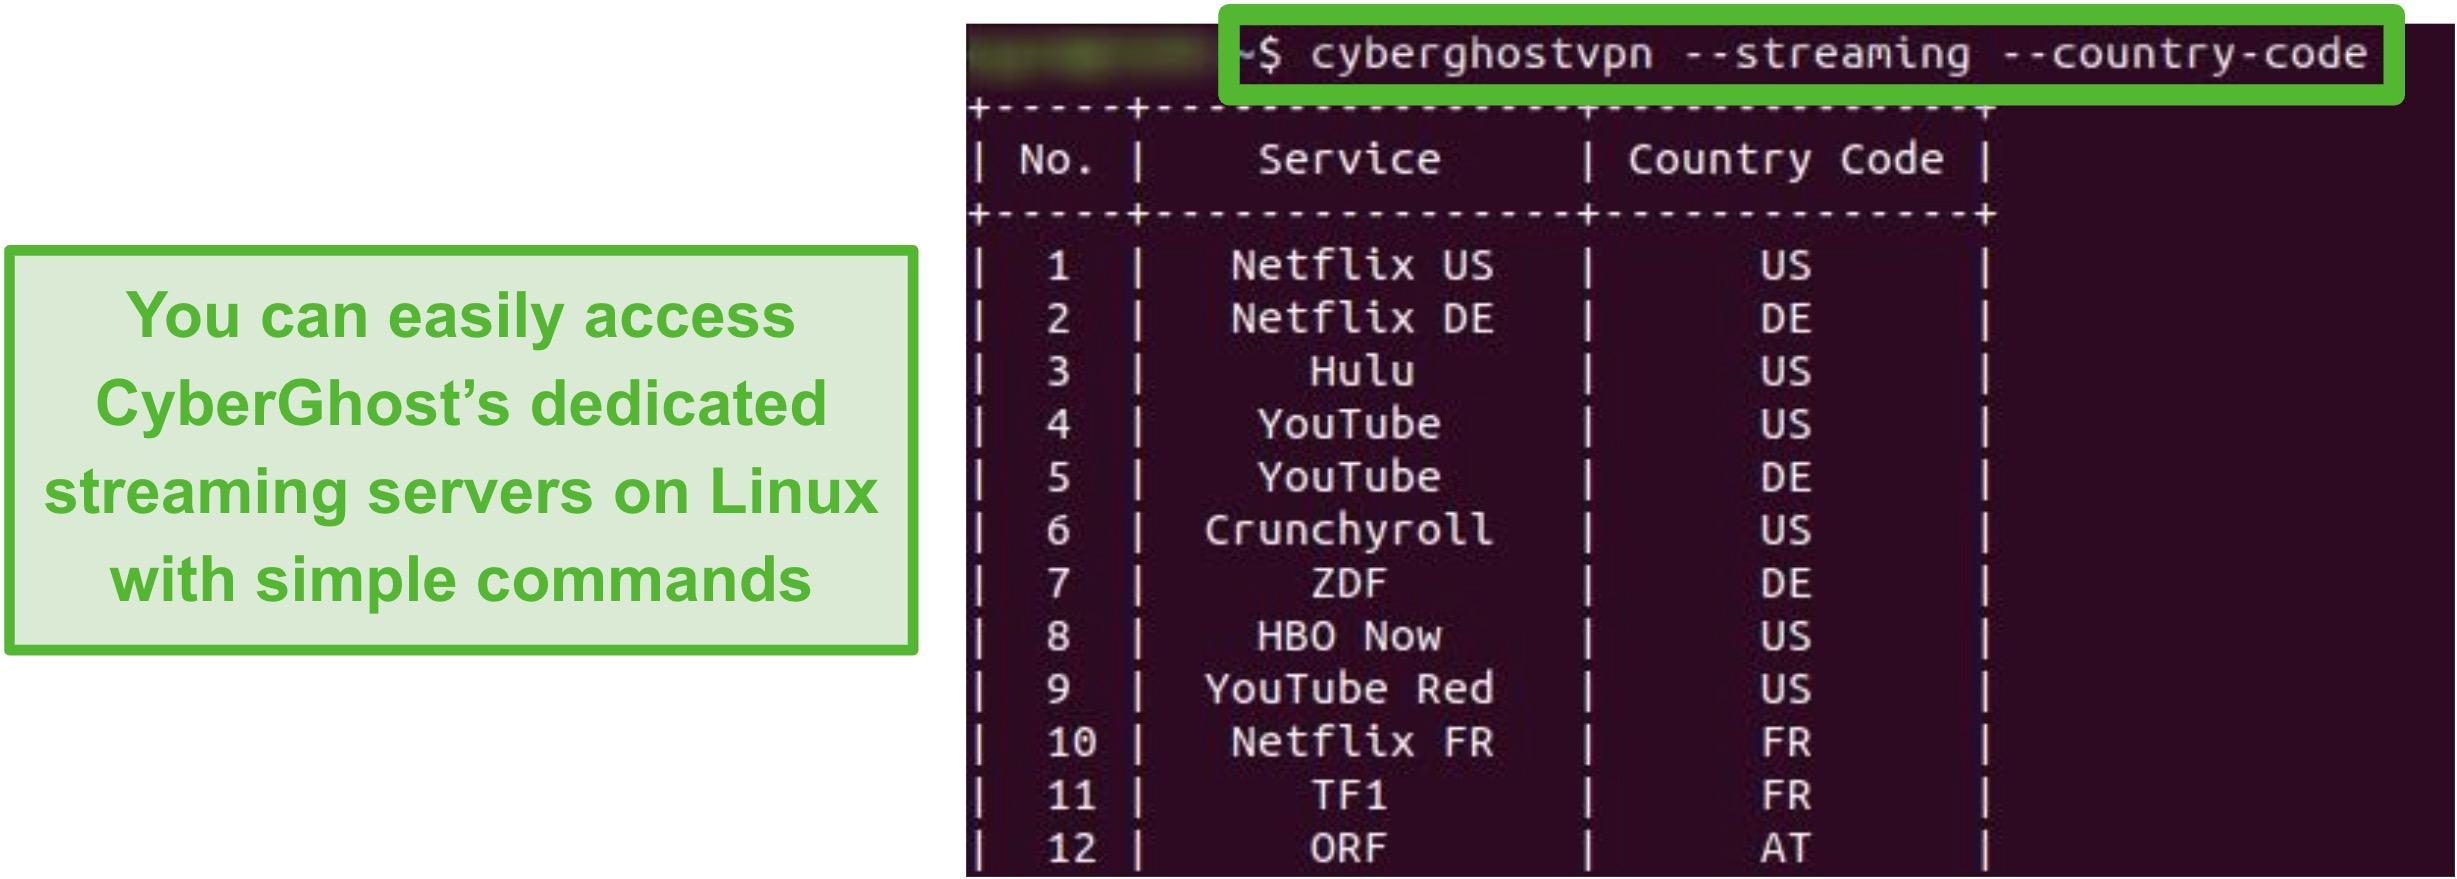 Screenshot of CyberGhost's dedicated streaming servers on Linux.